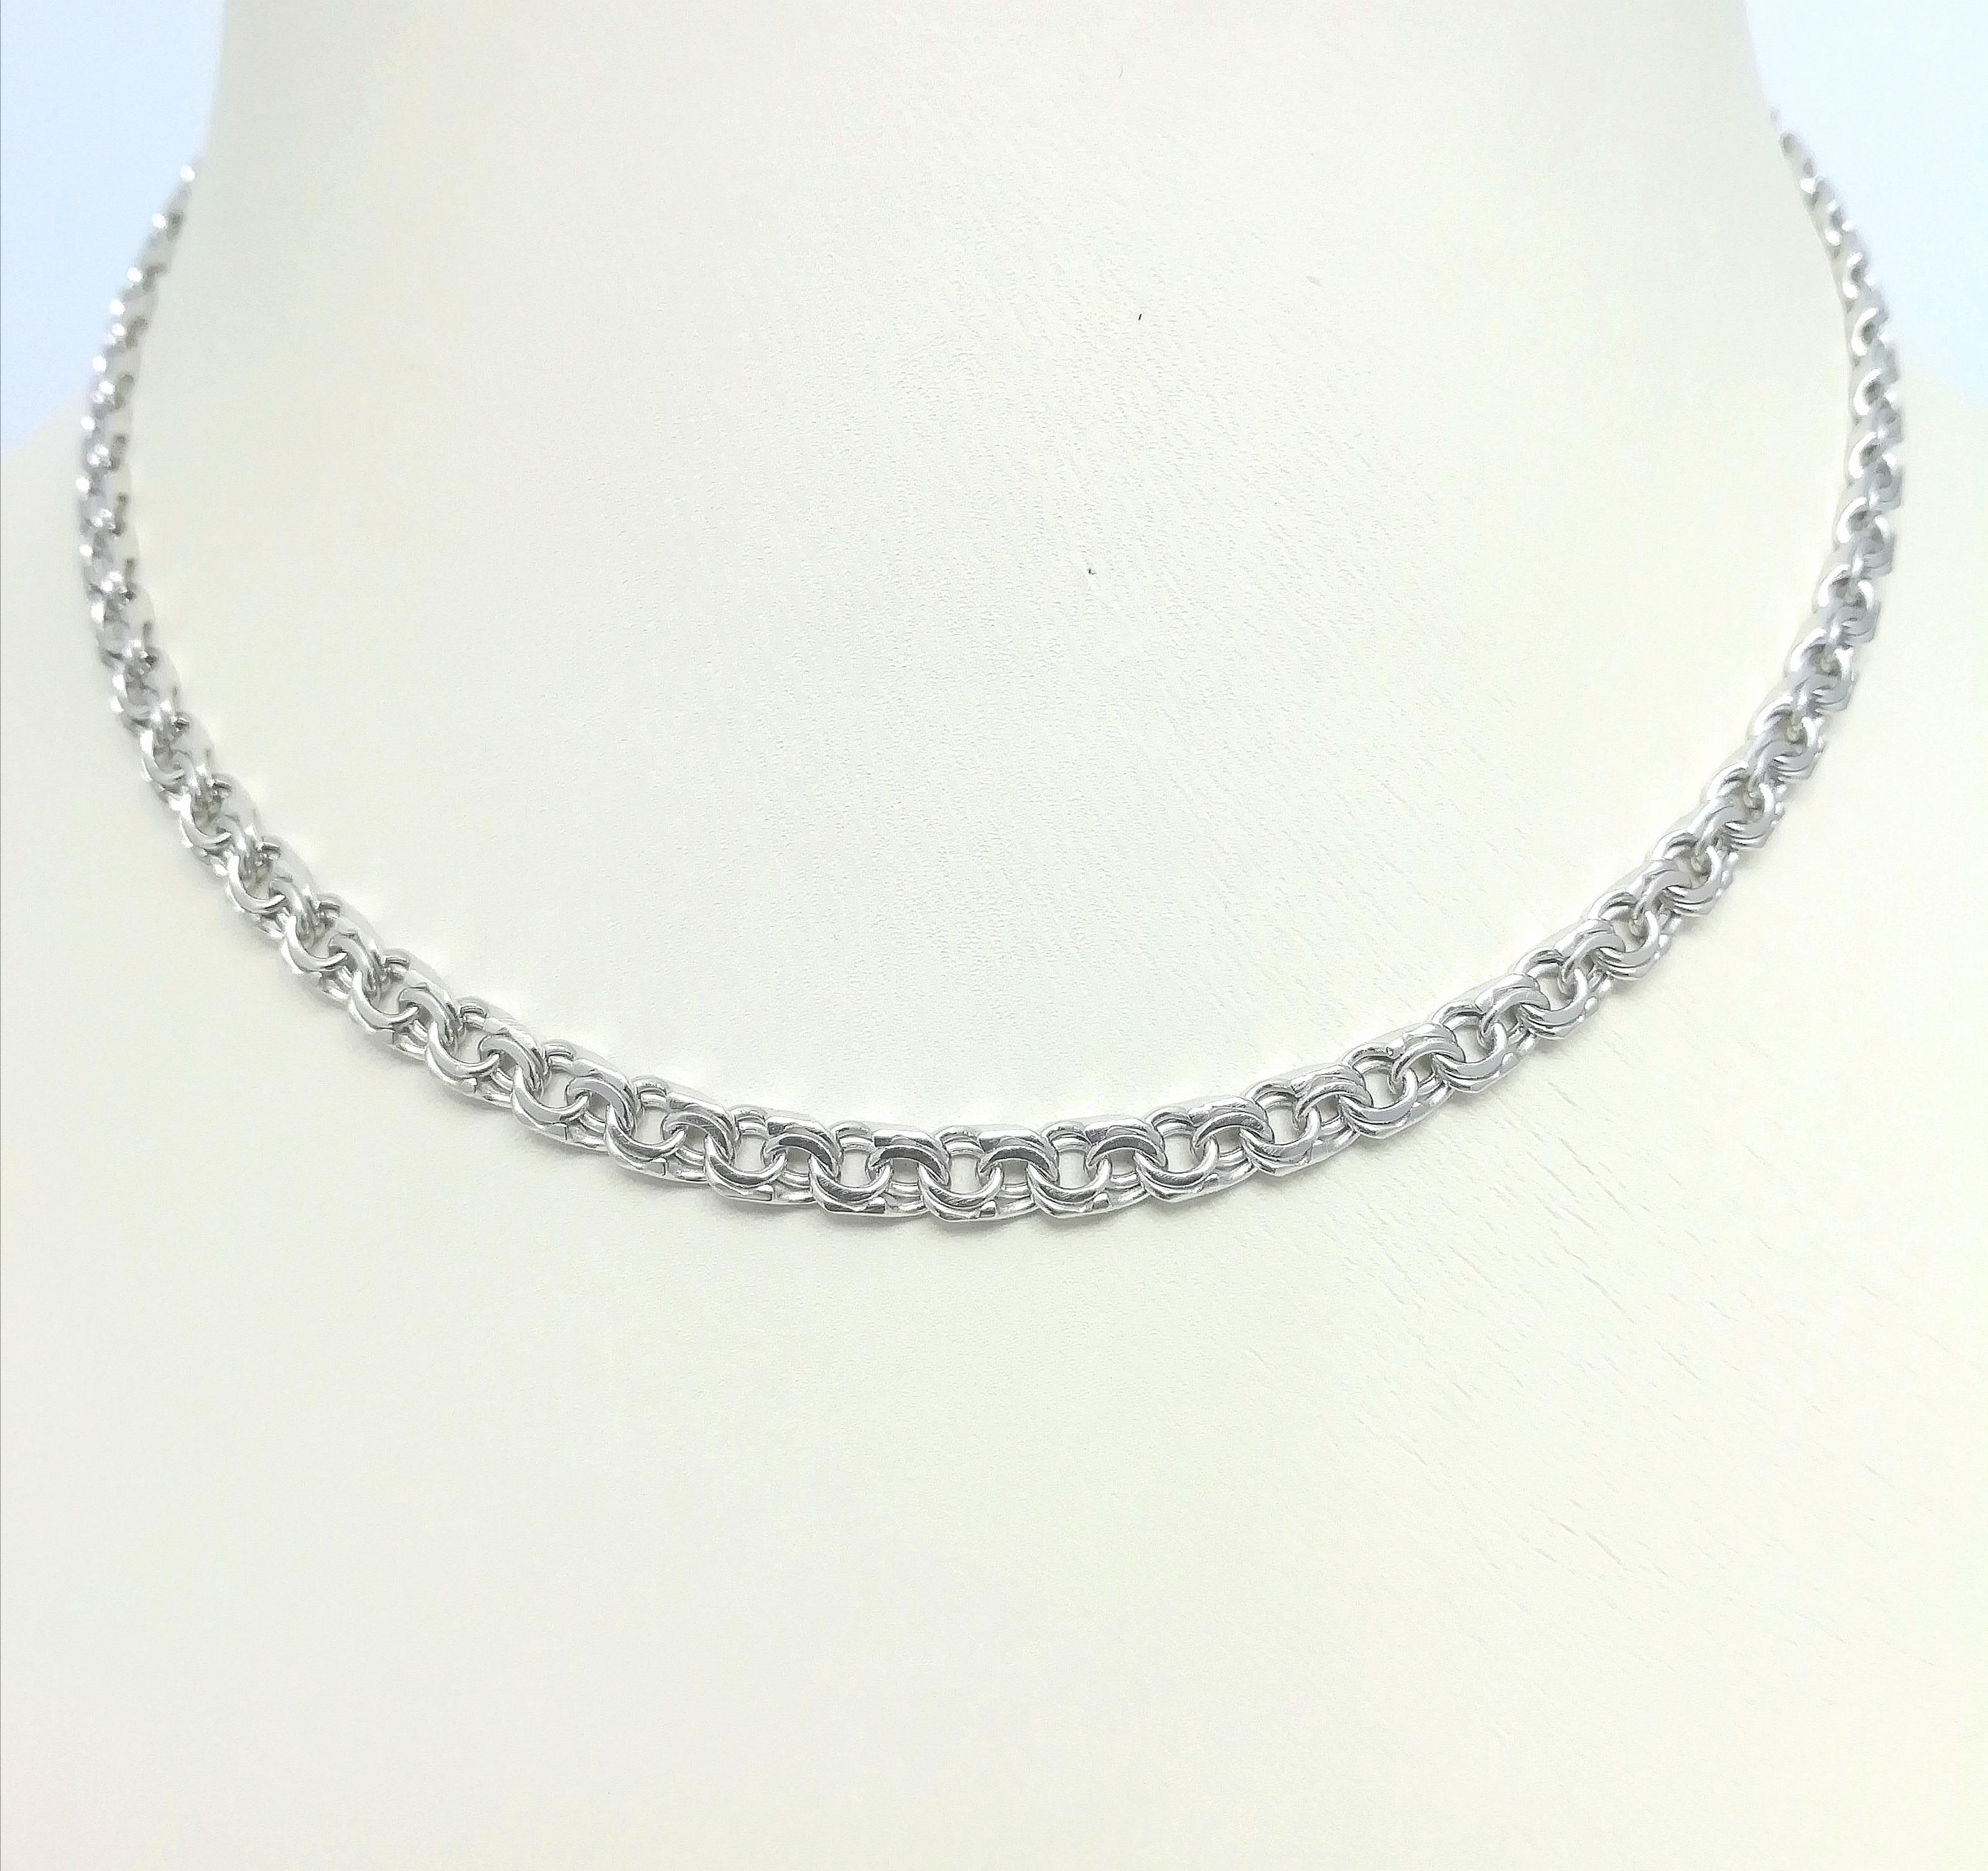 Серебро цепь дк240920-79 16,60гр